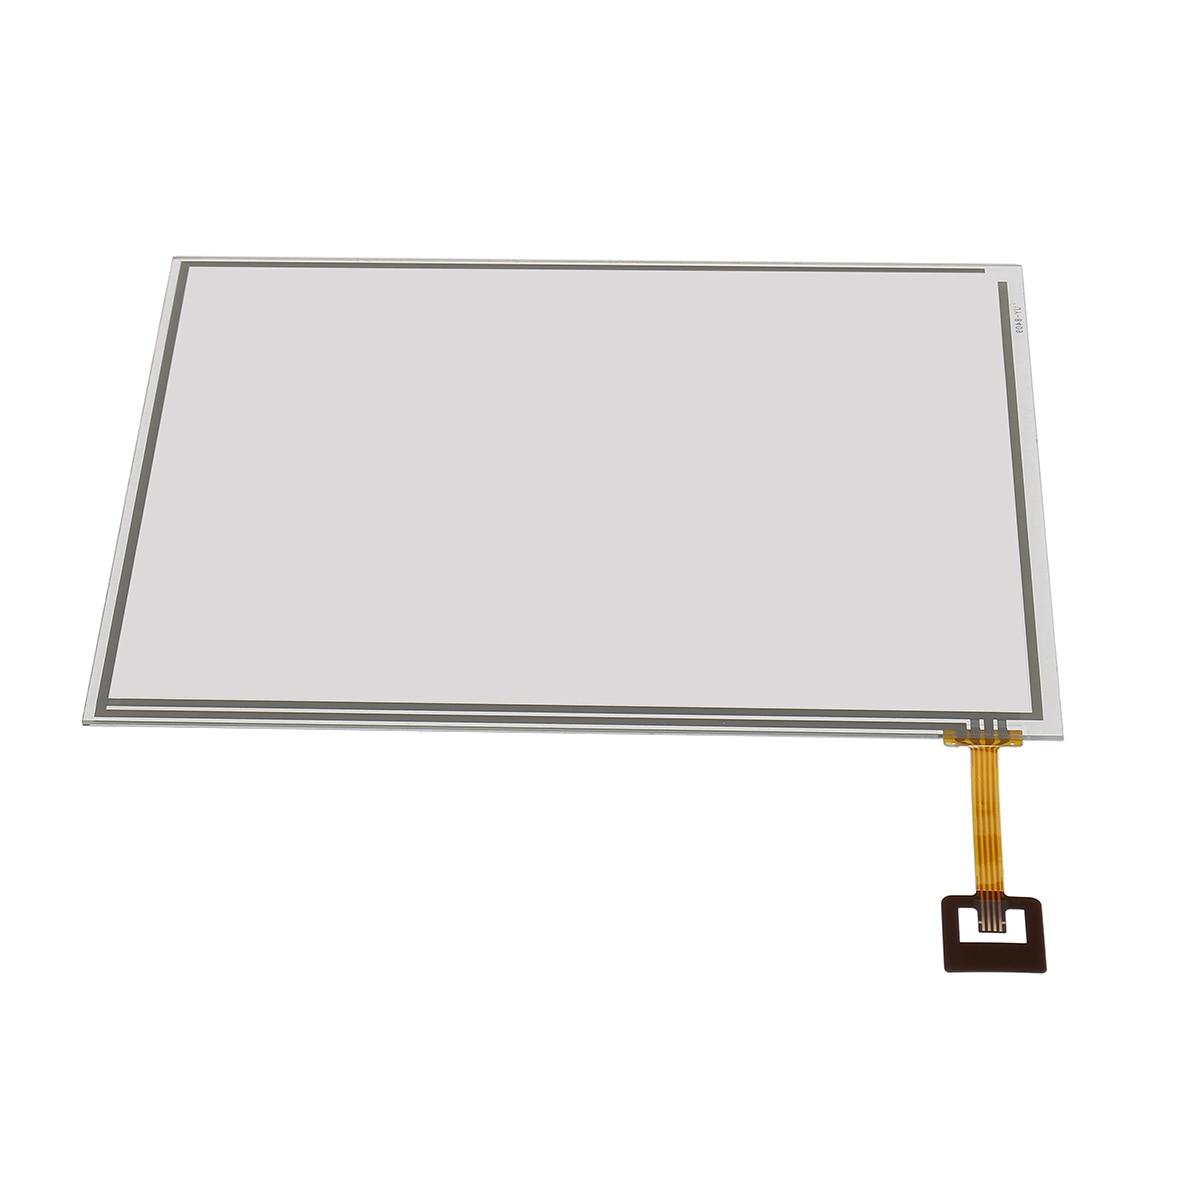 1 pc 8 pulgadas 4 pines pantalla táctil de cristal digitalizador LCD panel para Chrysler para Dodge Ghibli 8,4 RB5 RE2 monitor de coche